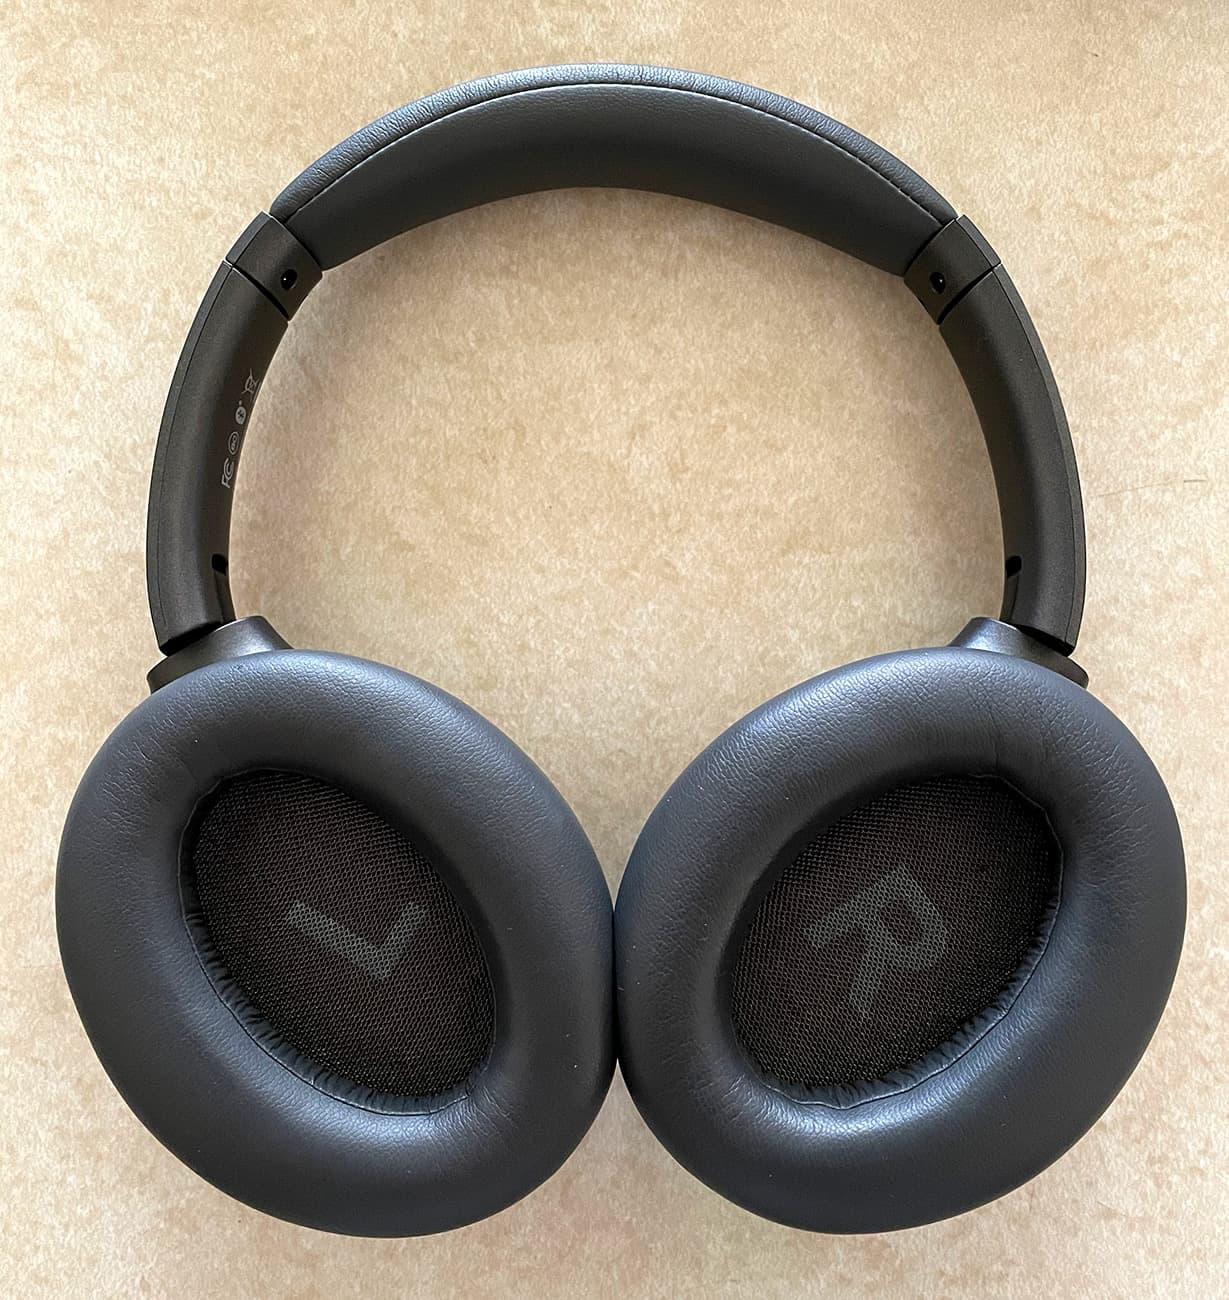 monoprice BT600ANC bluetooth headphones 003